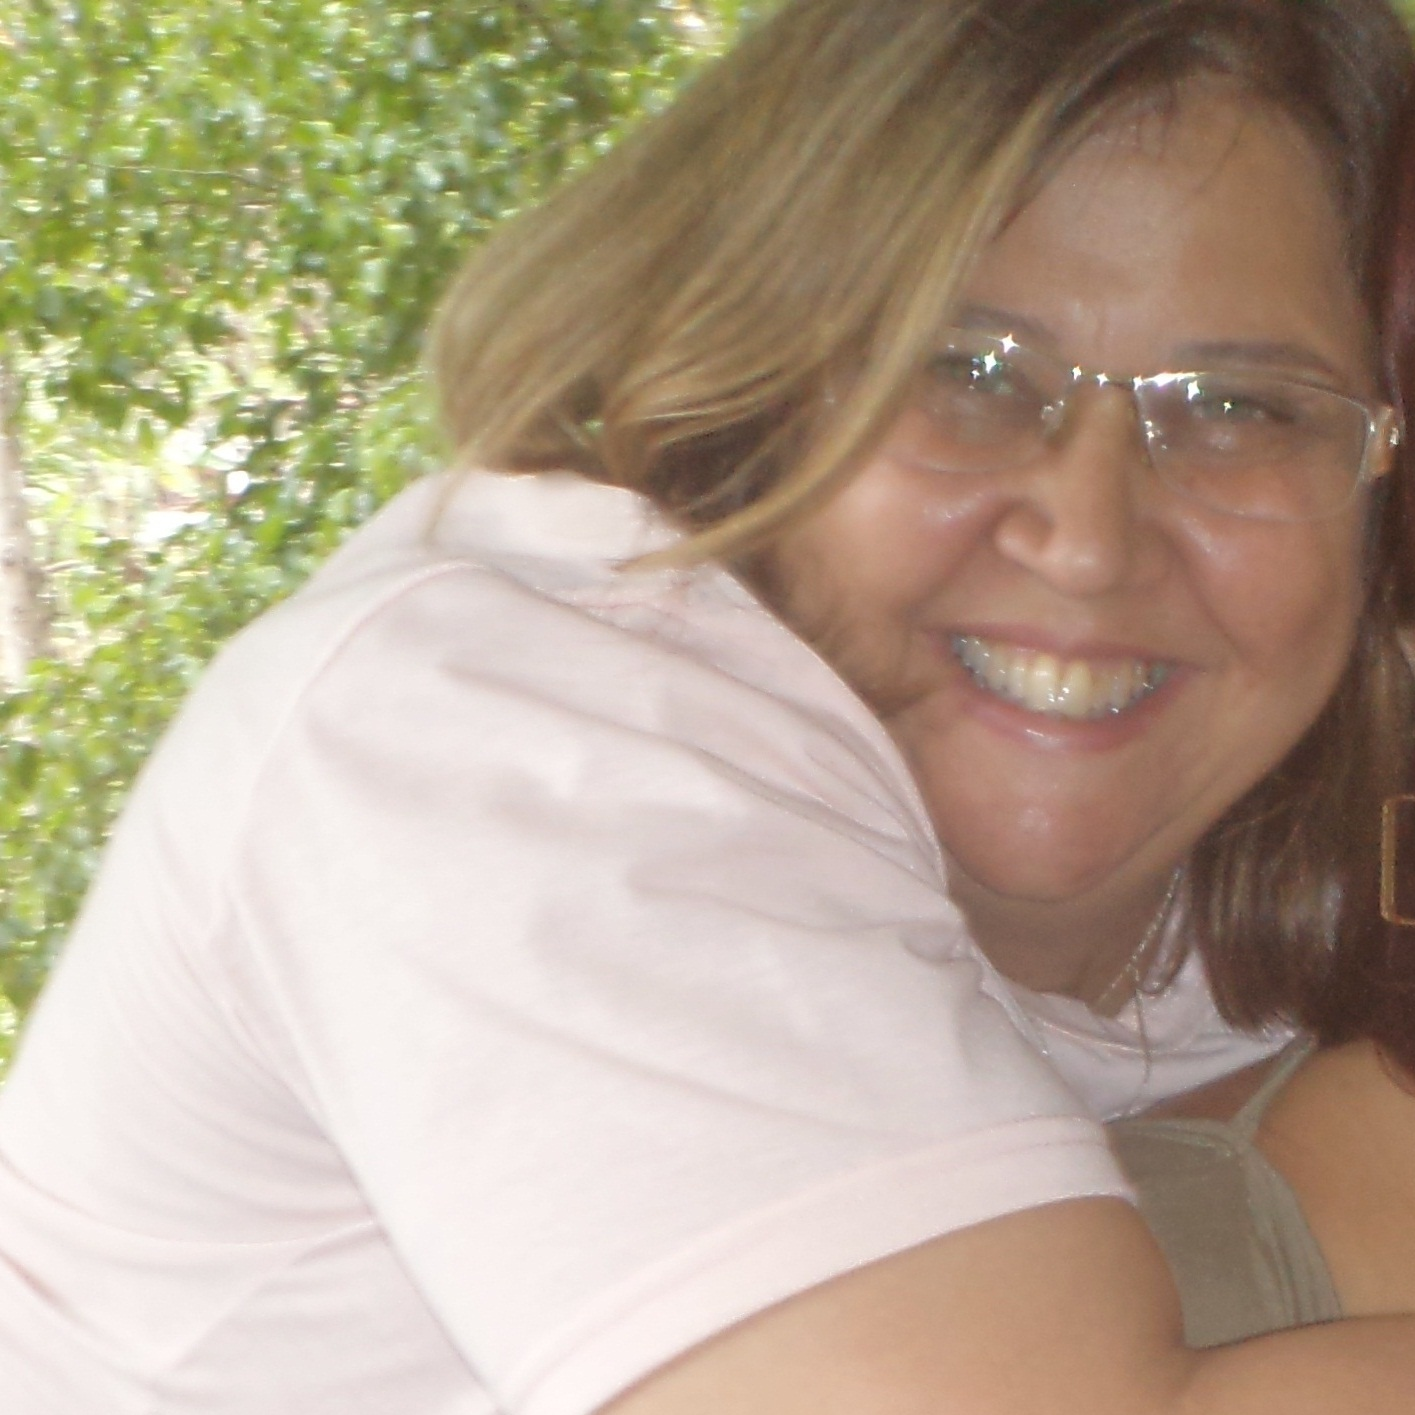 Luzinete Maria Nobre de Mello